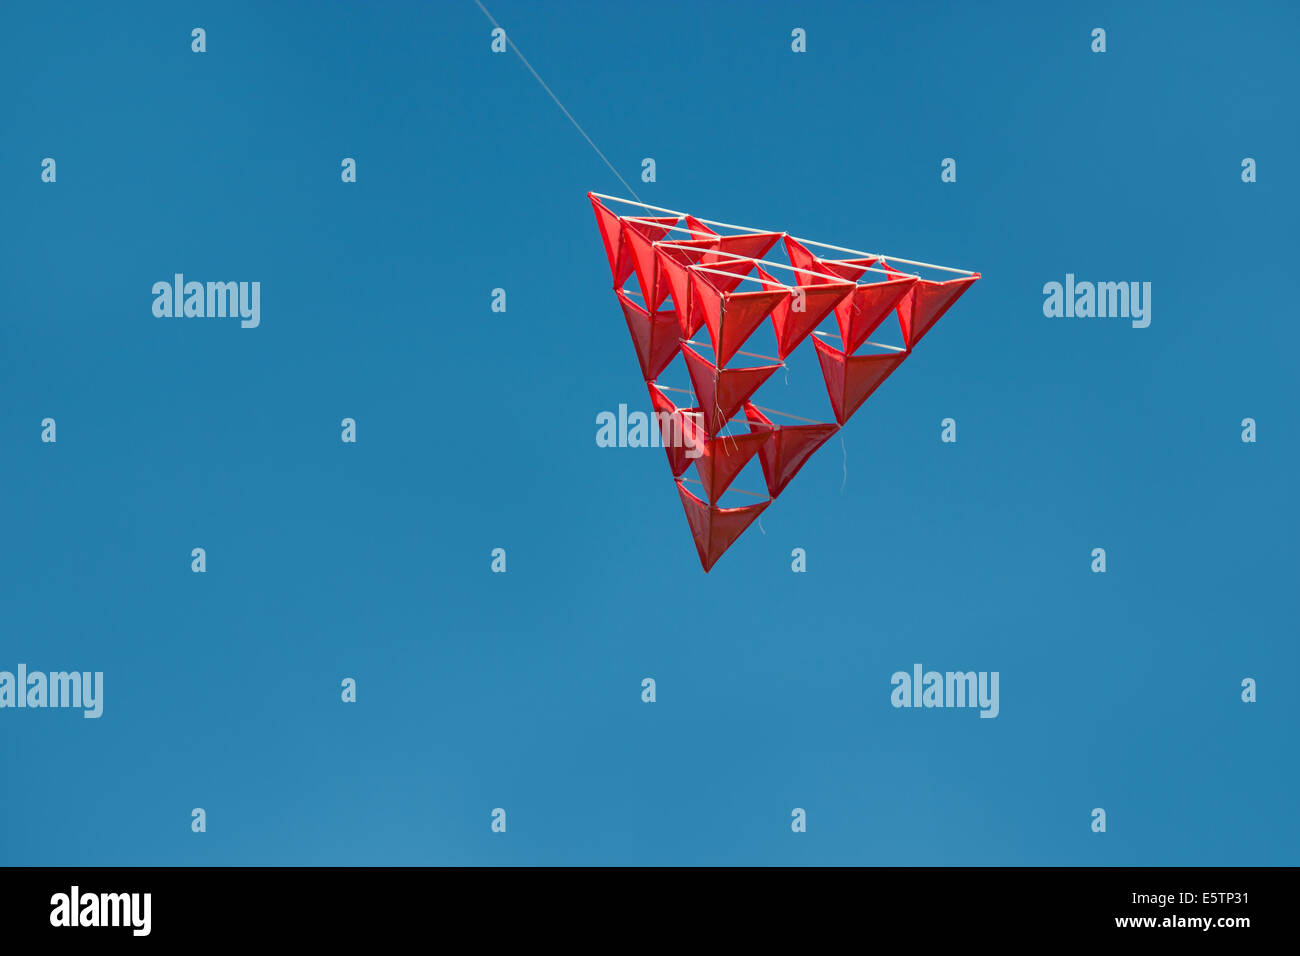 Unusual Kite Stock Photos & Unusual Kite Stock Images - Alamy